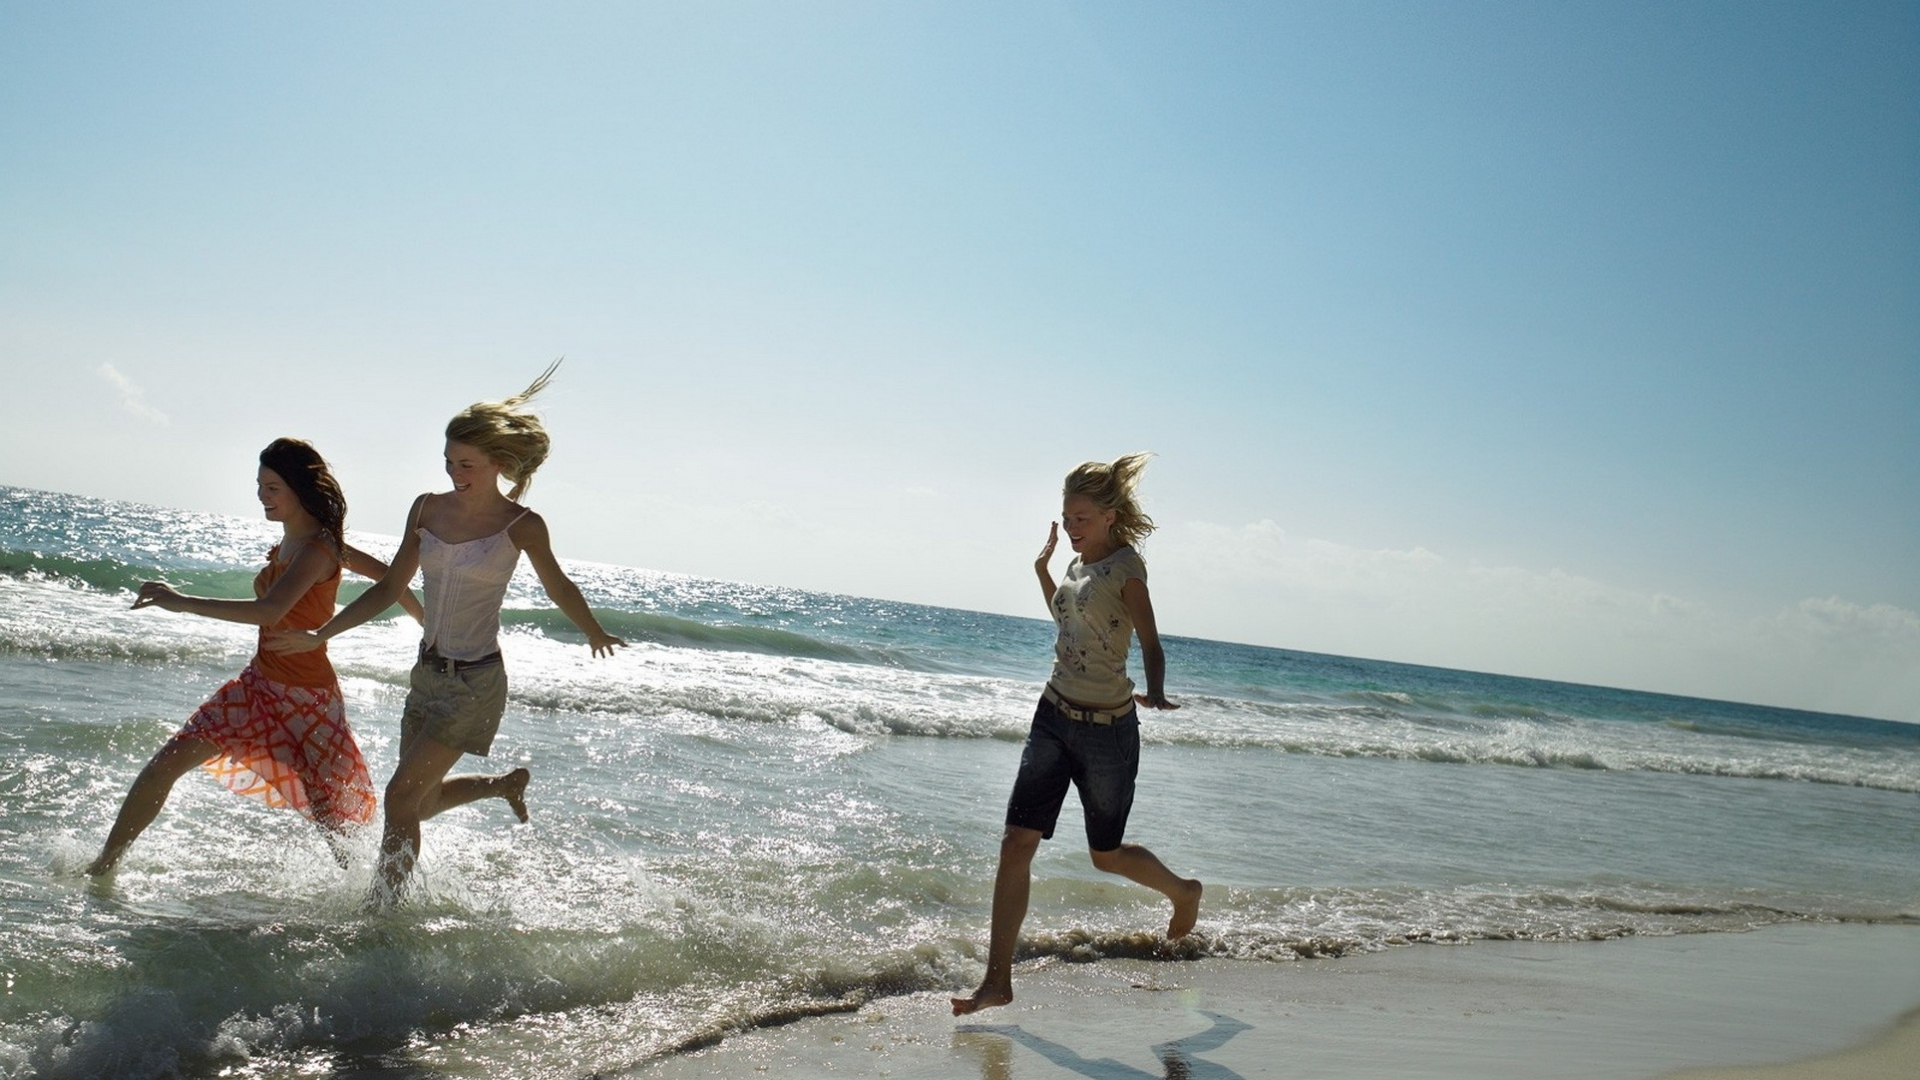 download wallpaper 1920x1080 girls, beach, sea, running, sand full